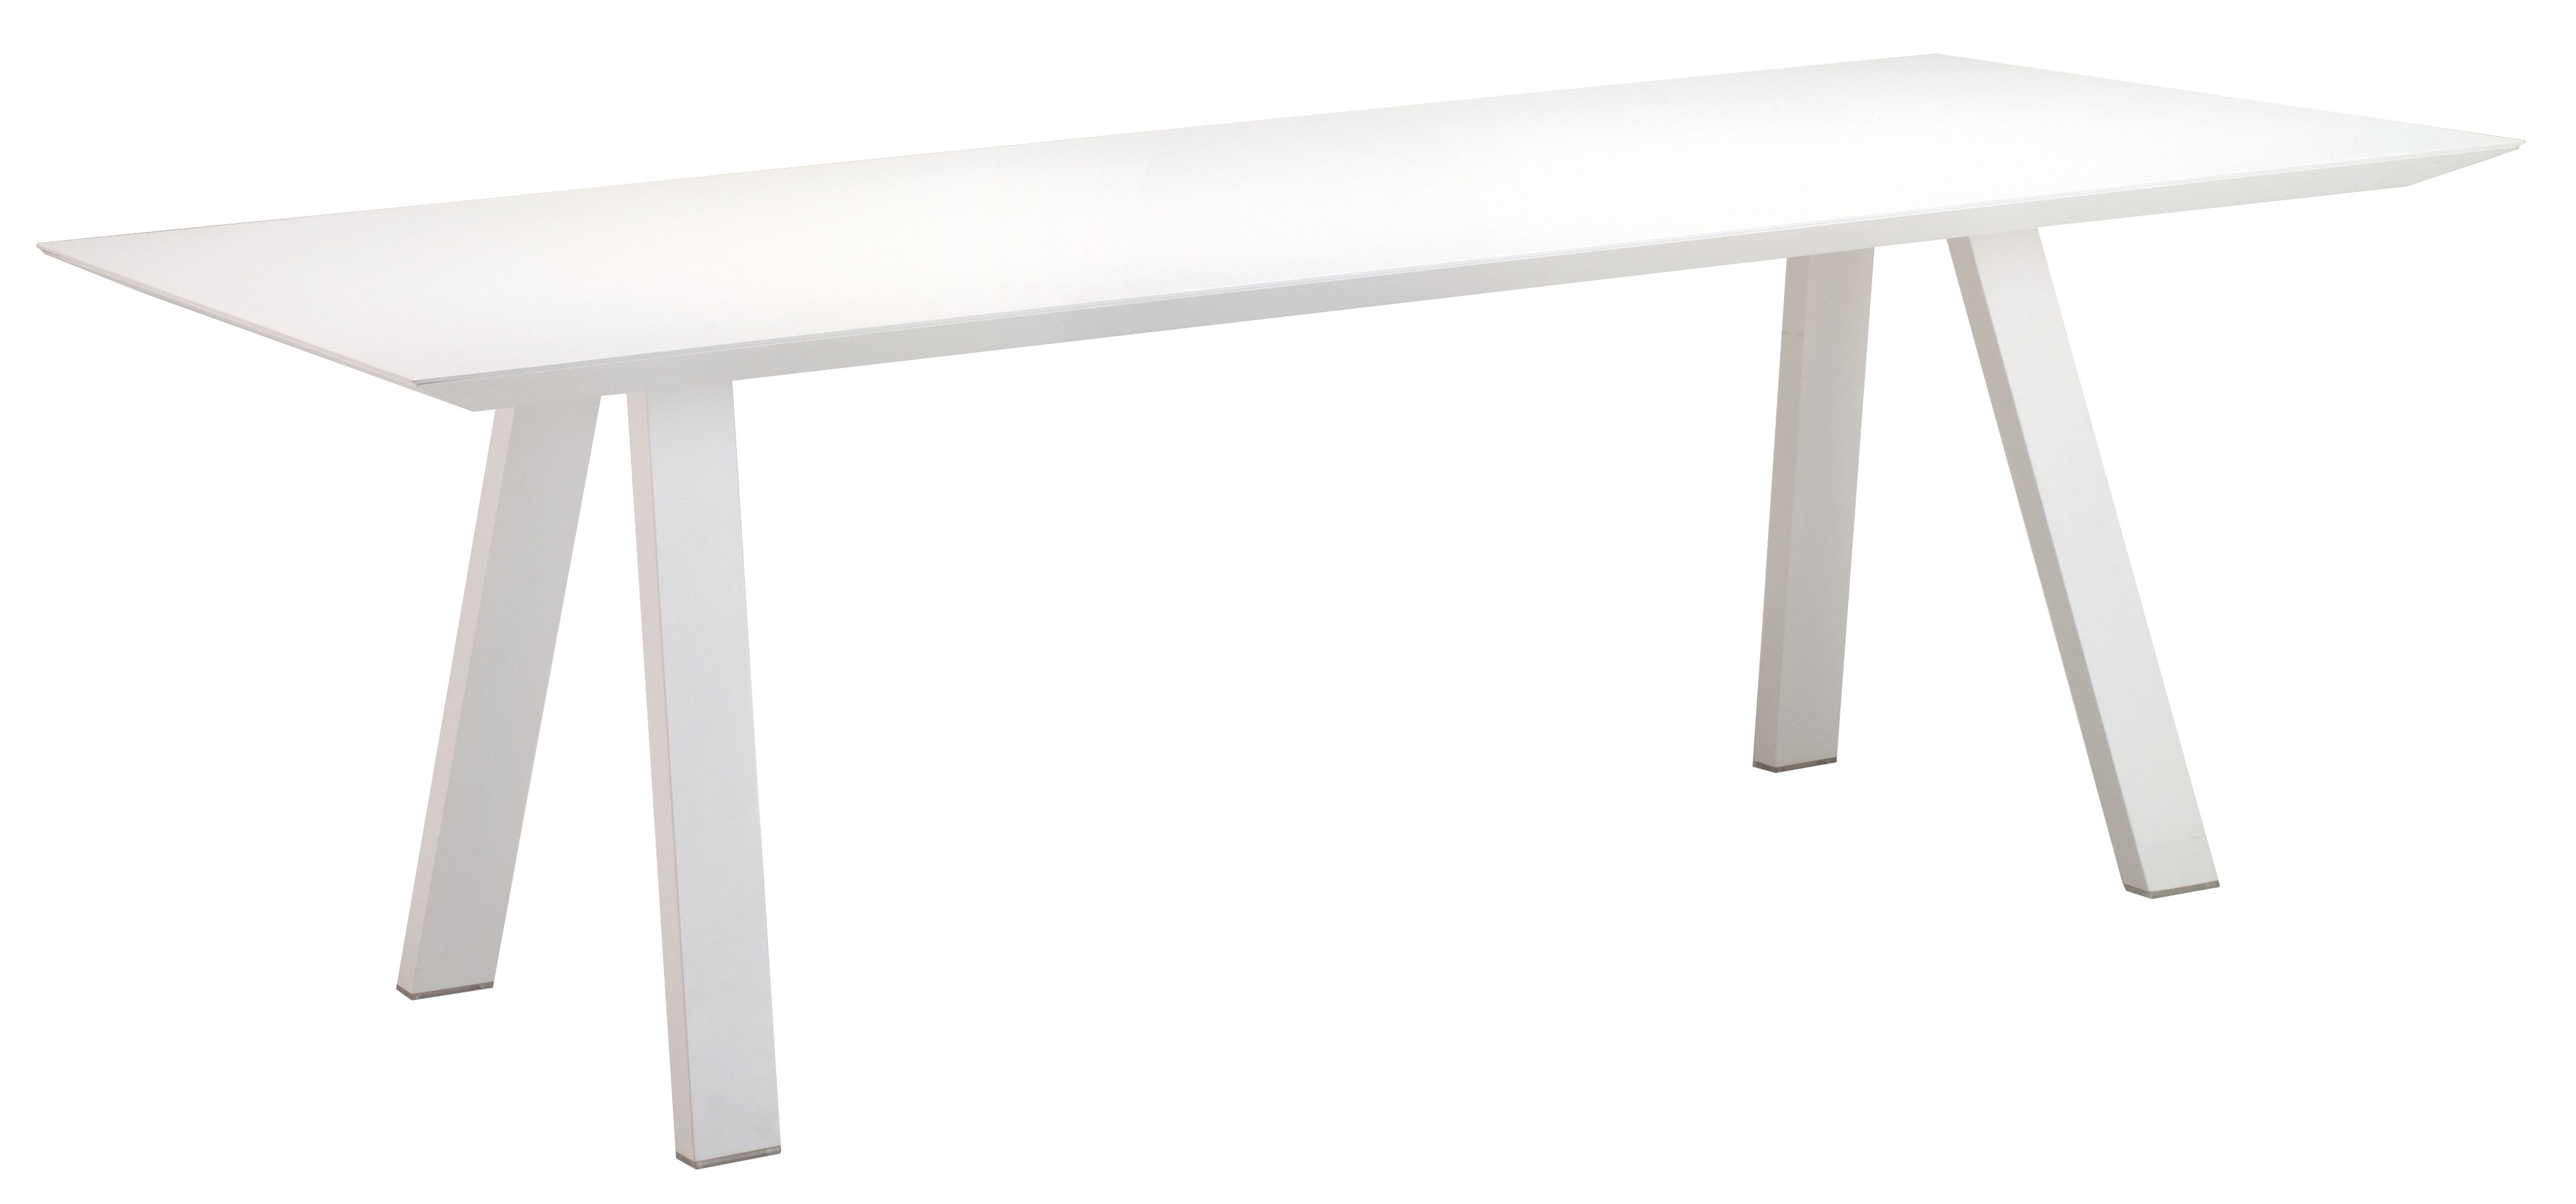 Outdoor - Garden Tables - Vanity Rectangular table - 220 x 110 cm - Aluminium by Vlaemynck - White - Lacquered aluminium